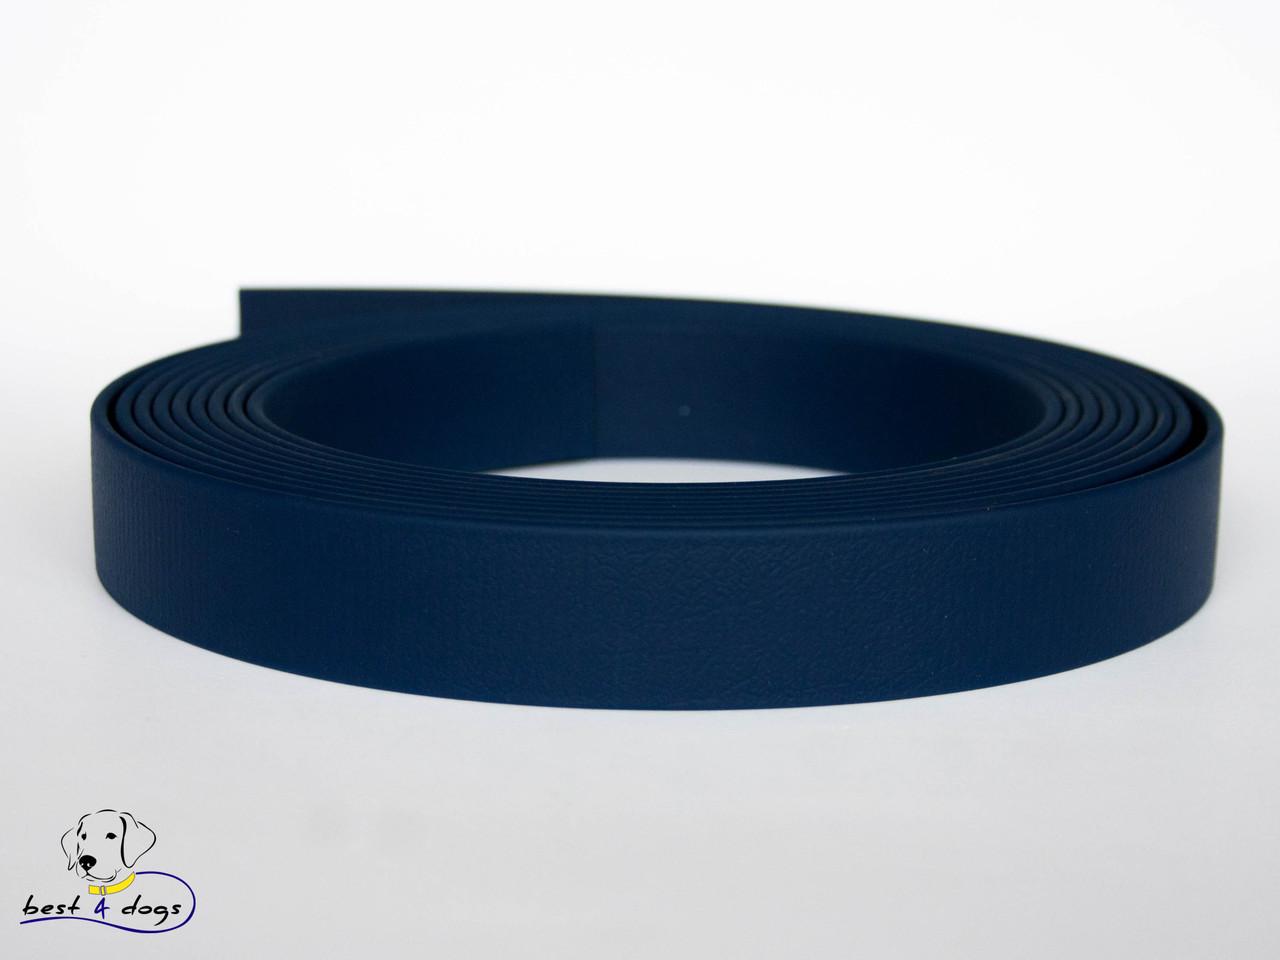 Ошейник-удавка из биотана, Синий Тёмный, 16мм